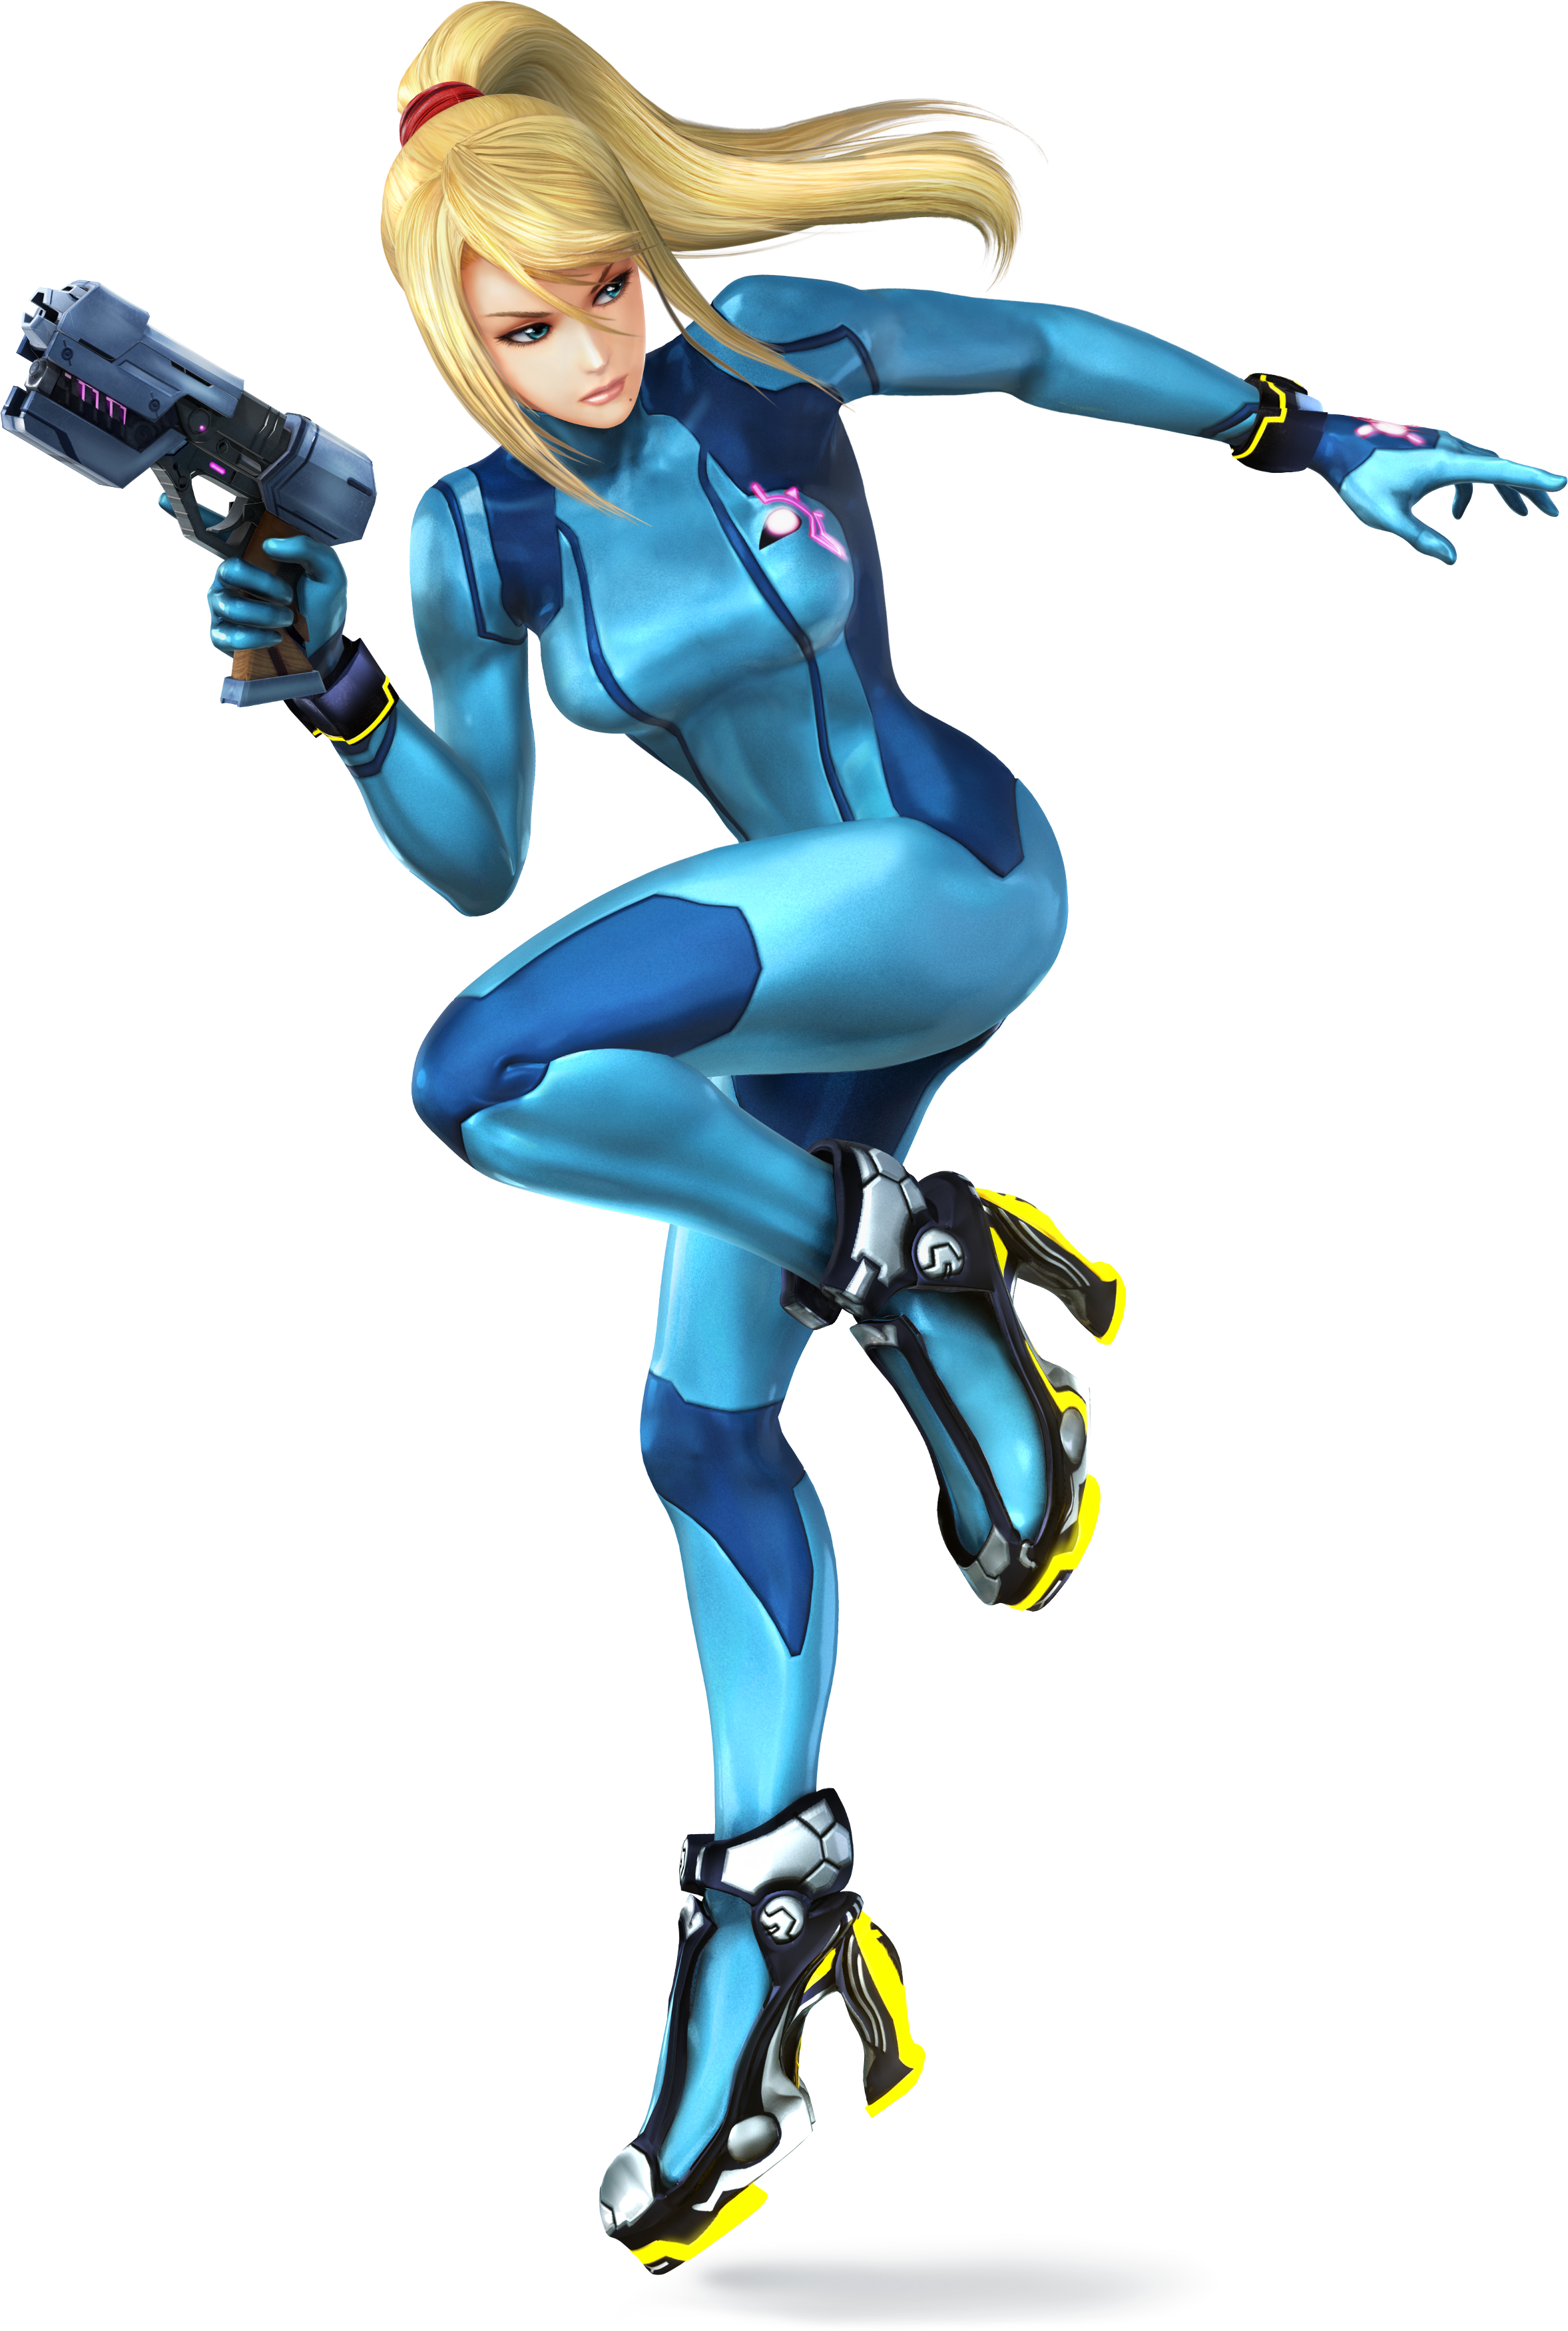 Zero Suit Samus From Super Smash Bros For Nintendo 3DS And Wii U